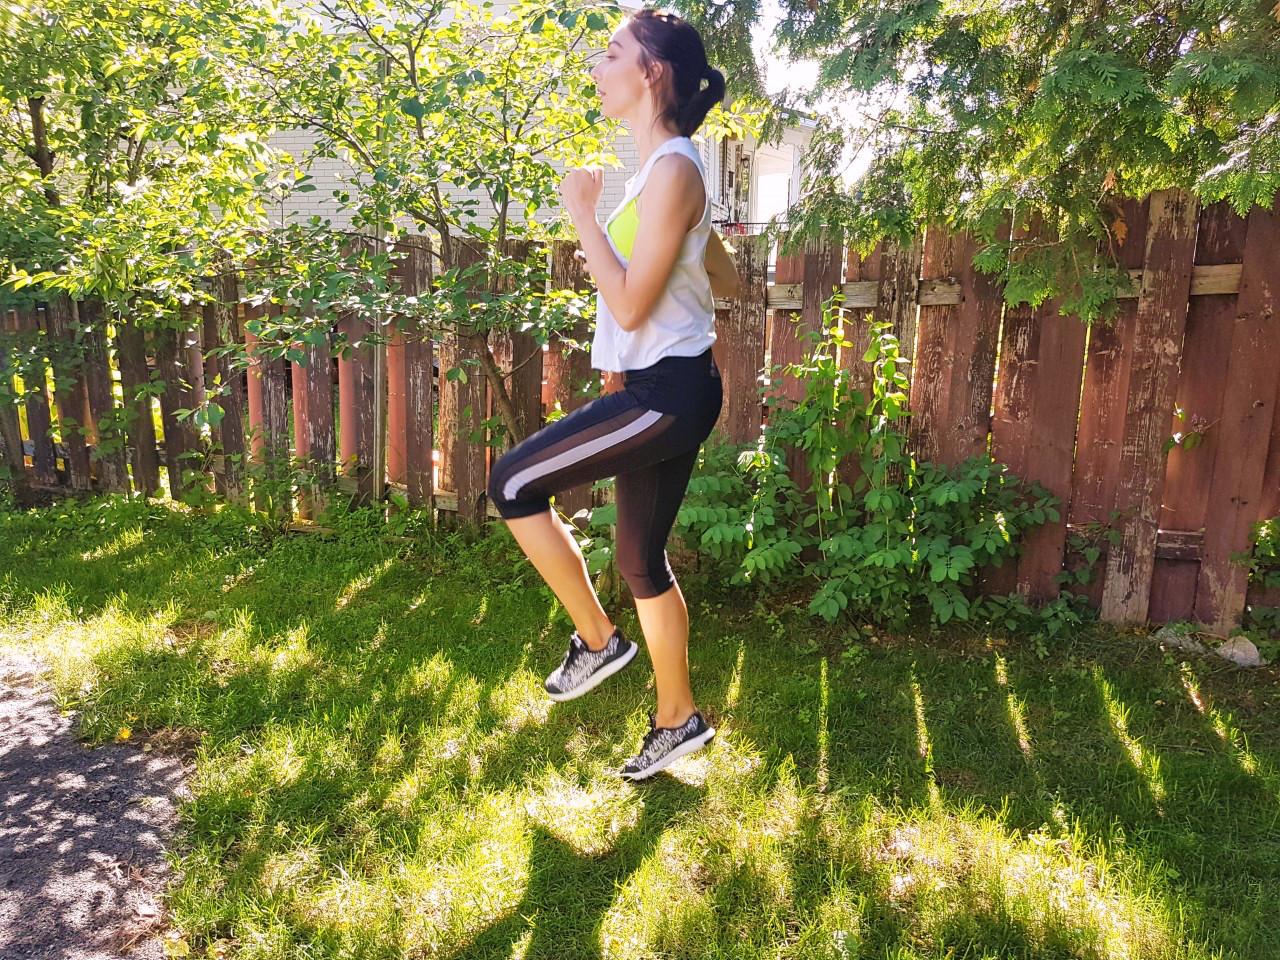 fitness, forever 21, health, wellness, cardio, running, nike, Victoria secret, sports, blogger, lifestyle, Montreal, female, women's health